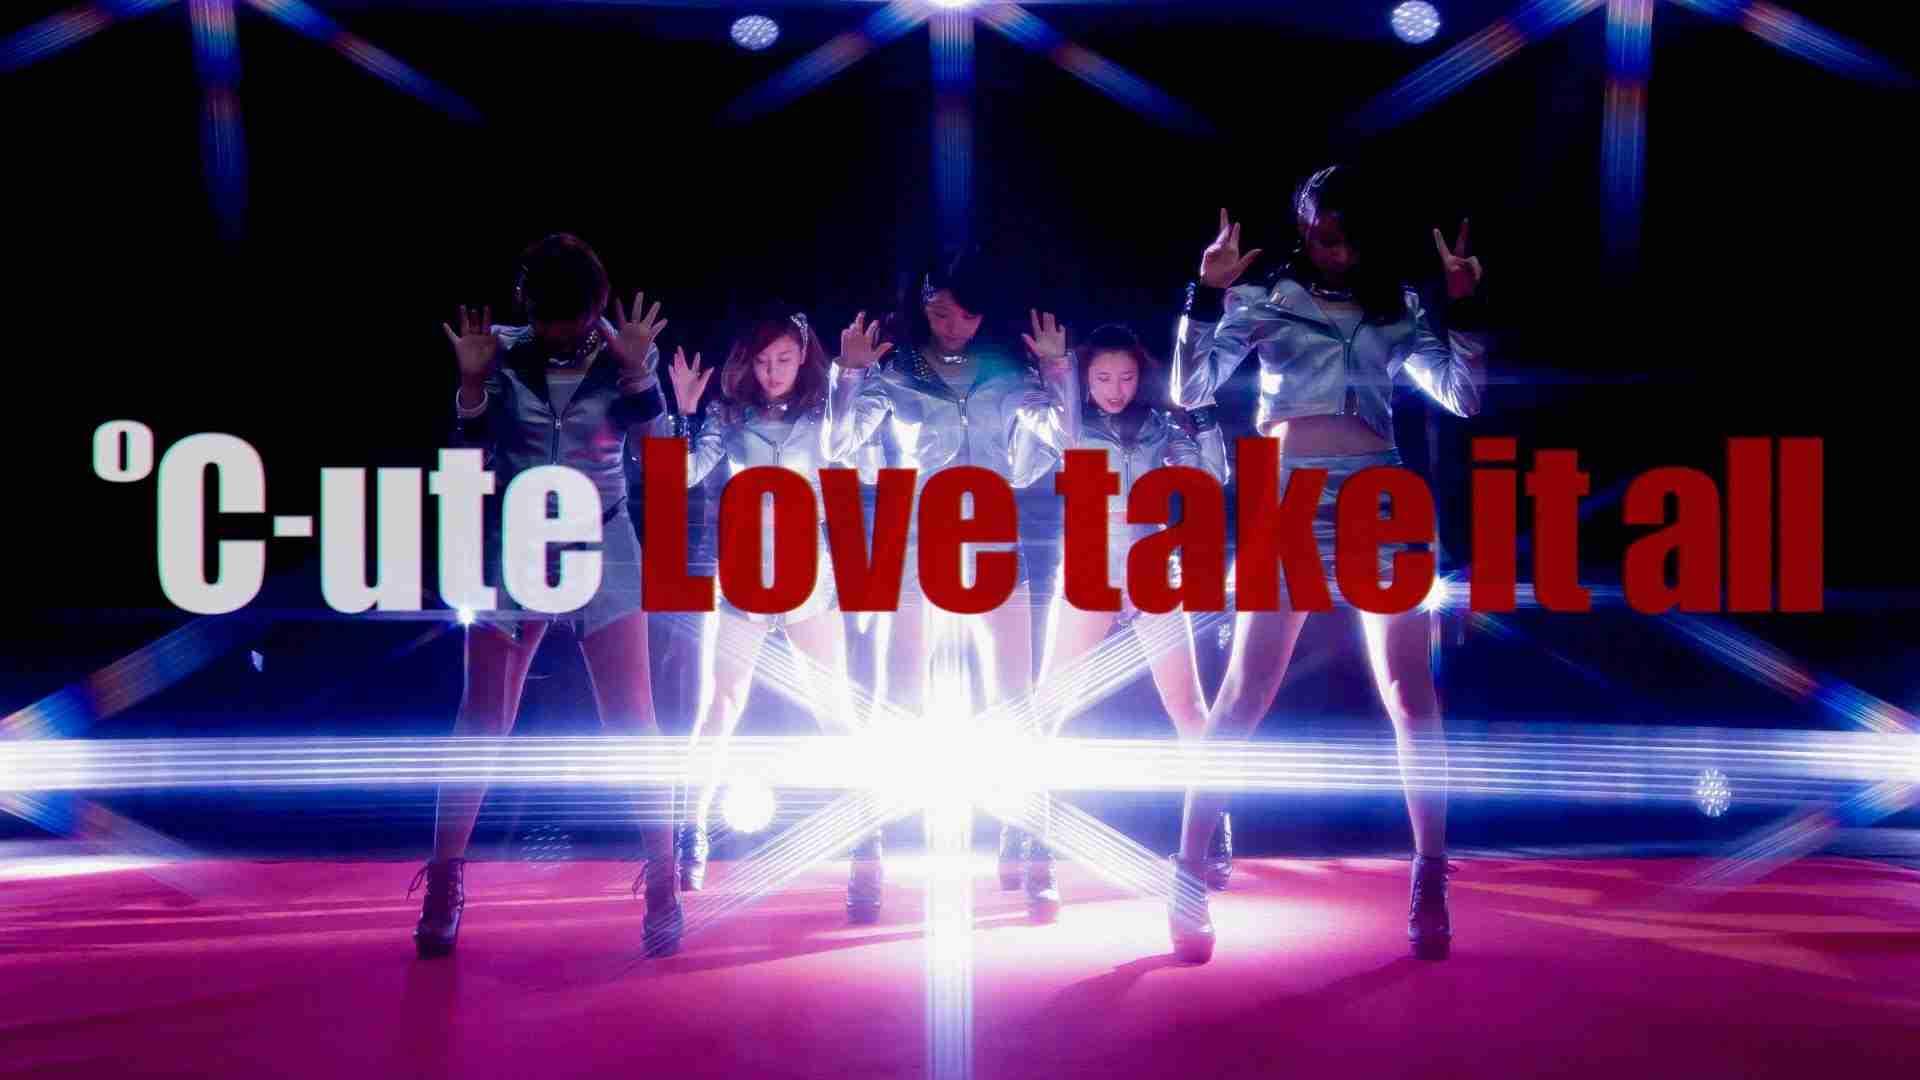 ℃-ute 『Love take it all』 (Dance Shot Ver.) - YouTube